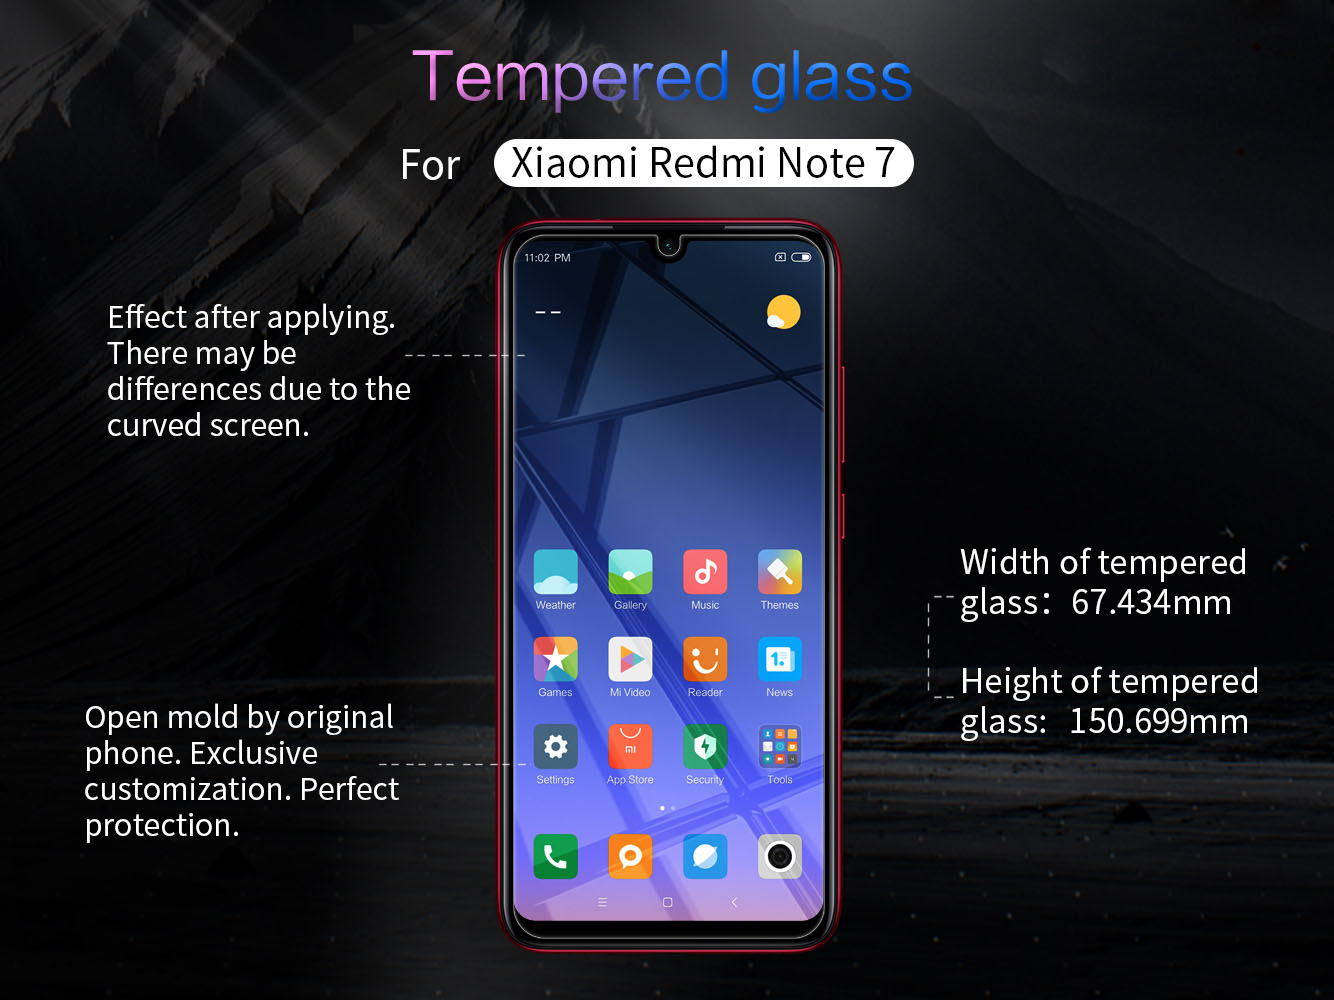 XIAOMI Redmi Note 7 screen protector